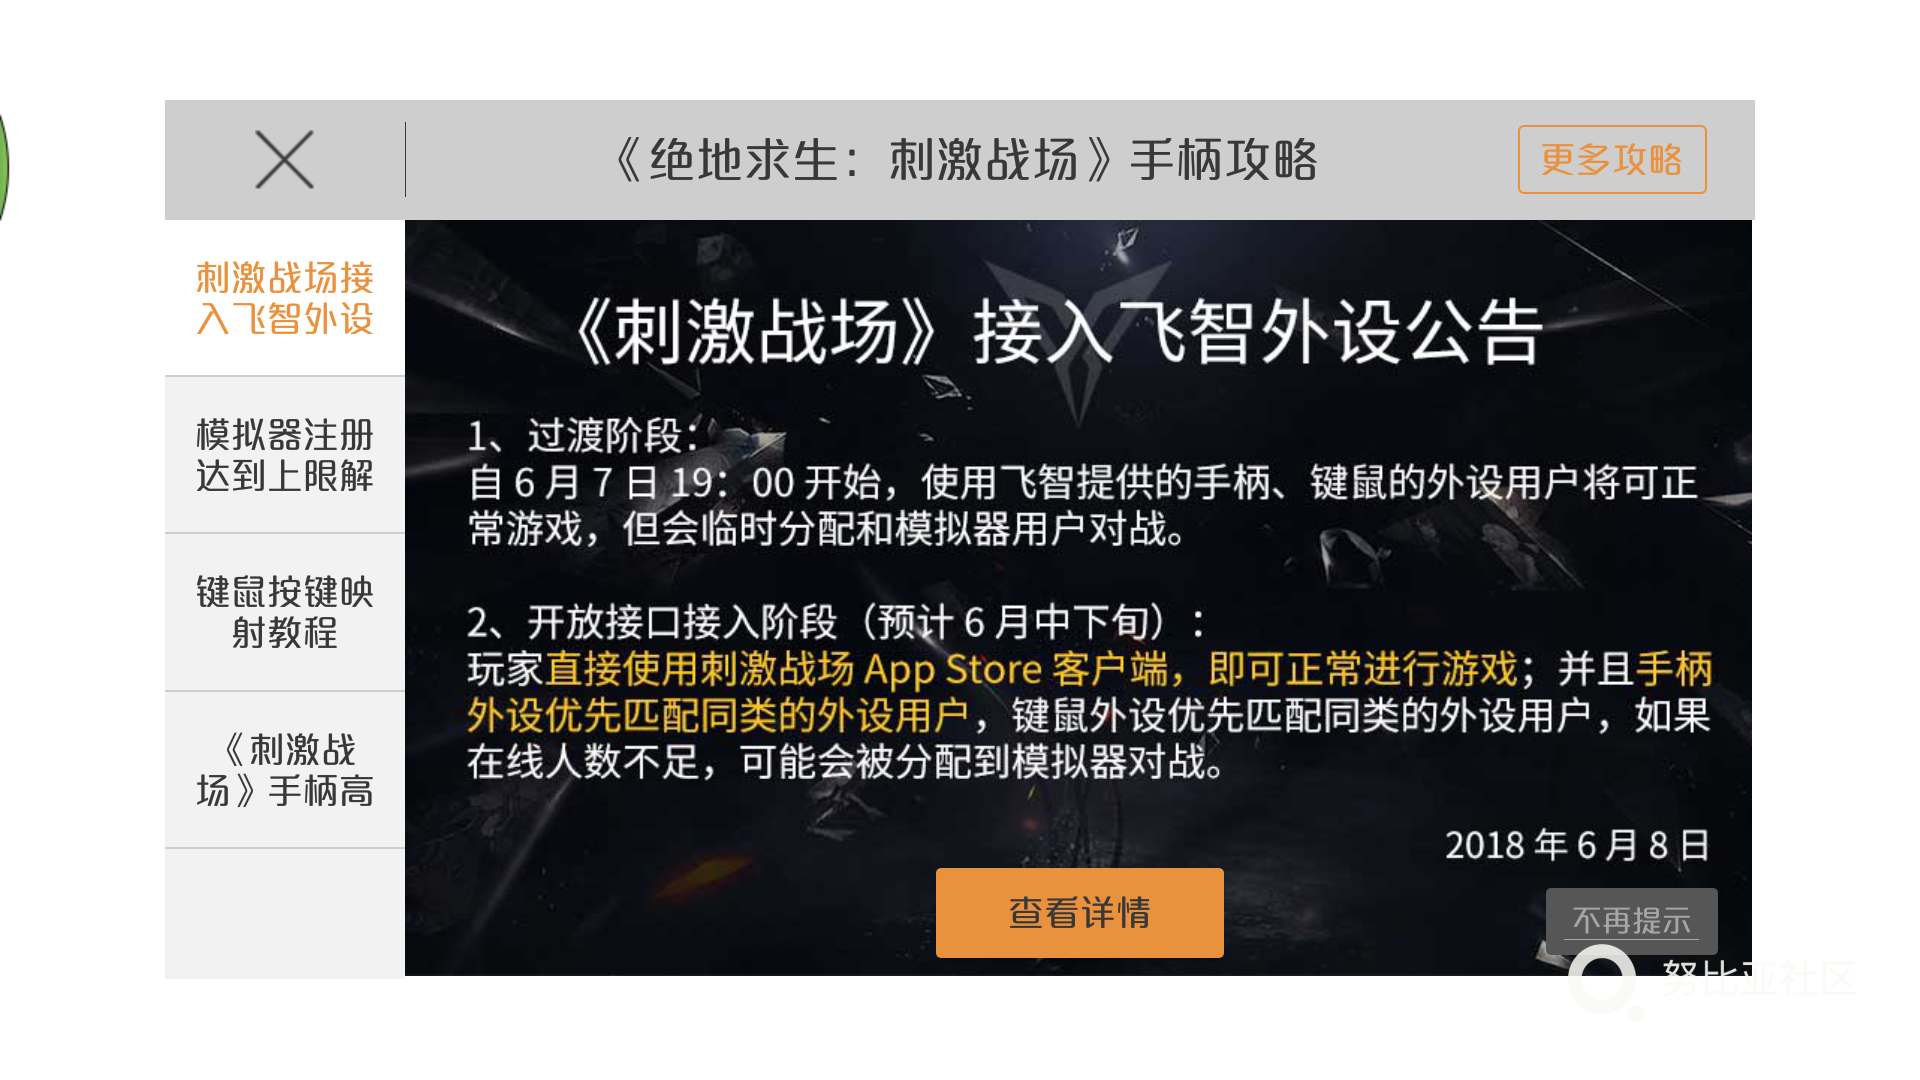 Screenshot_2018-06-09-13-02-19.png